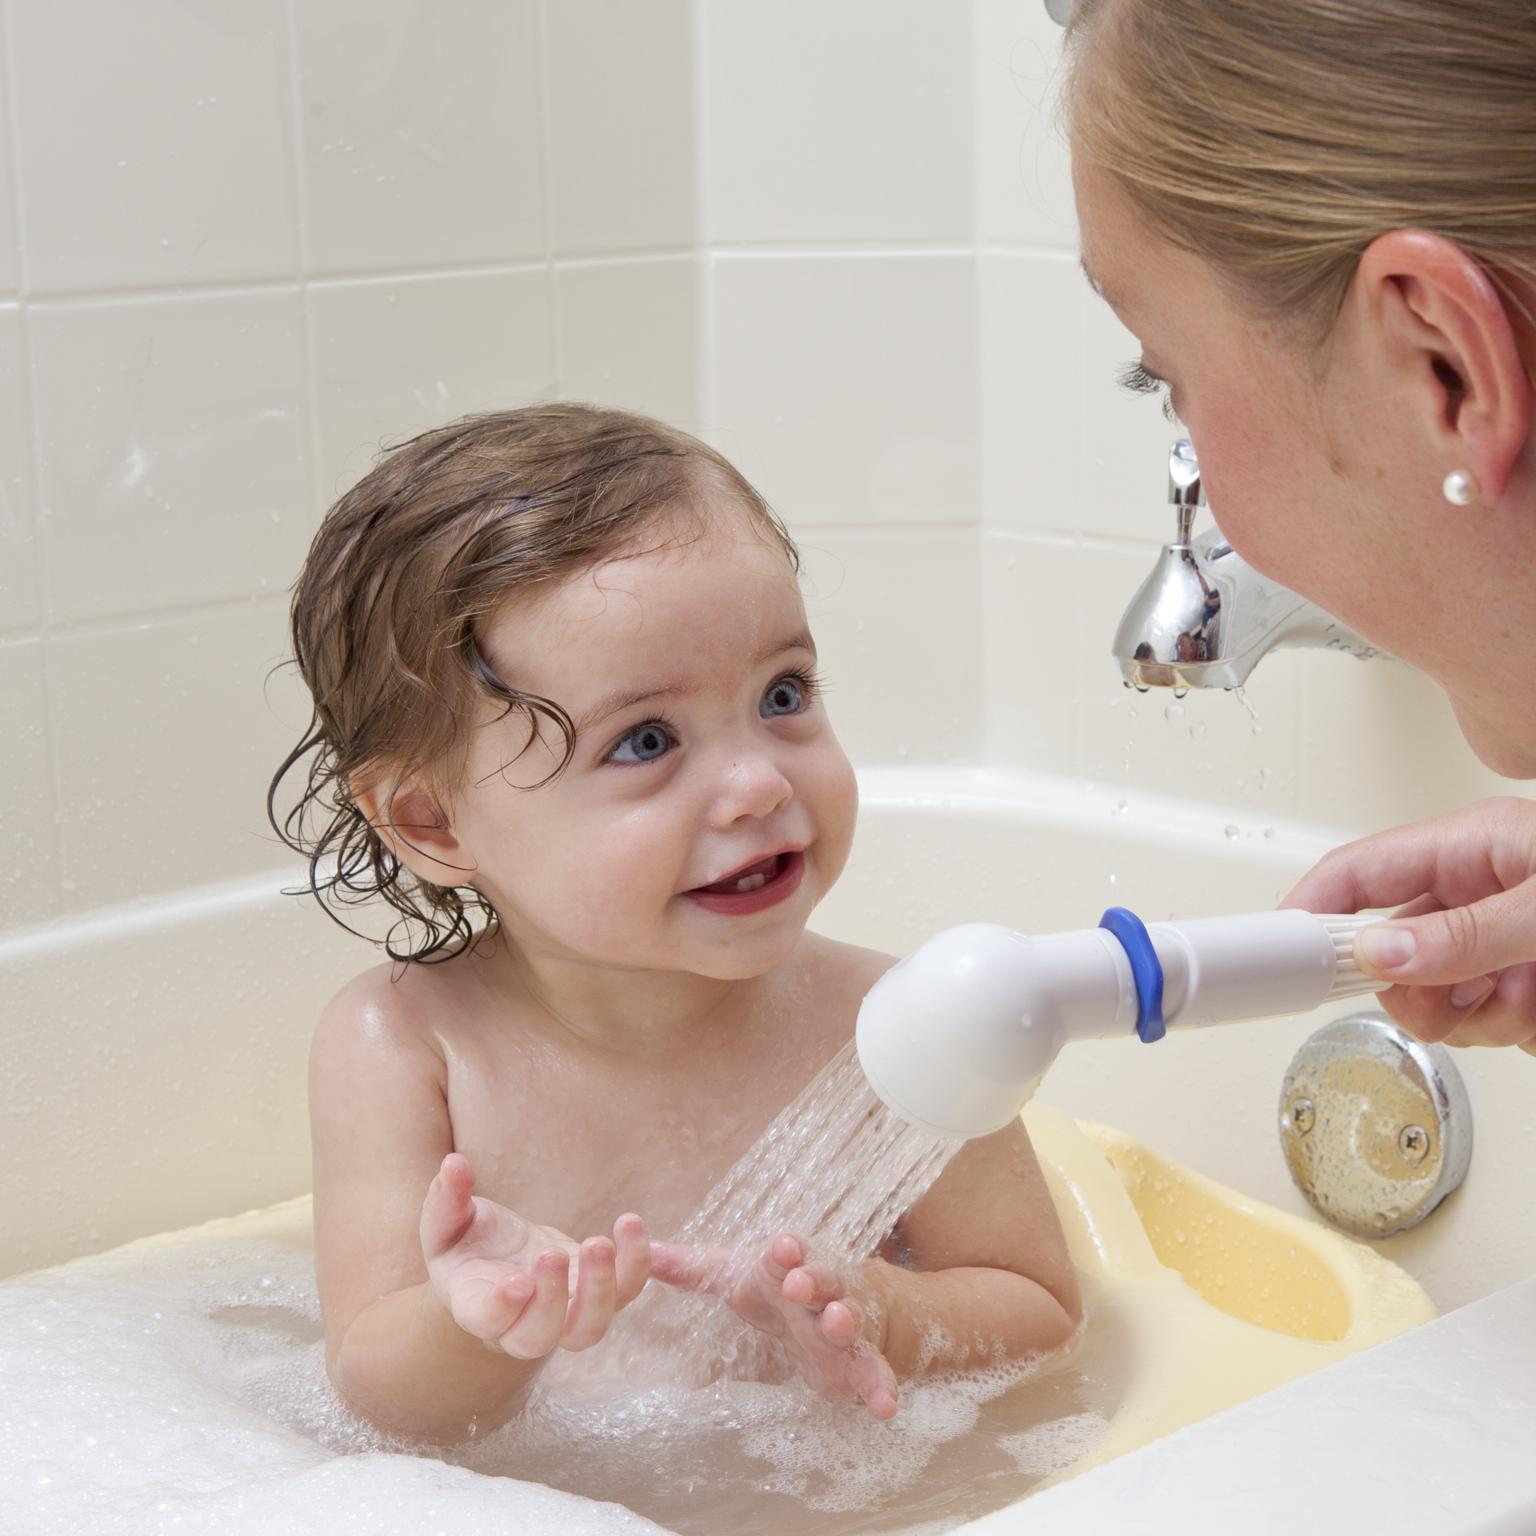 Give Them a Calming Night Bath